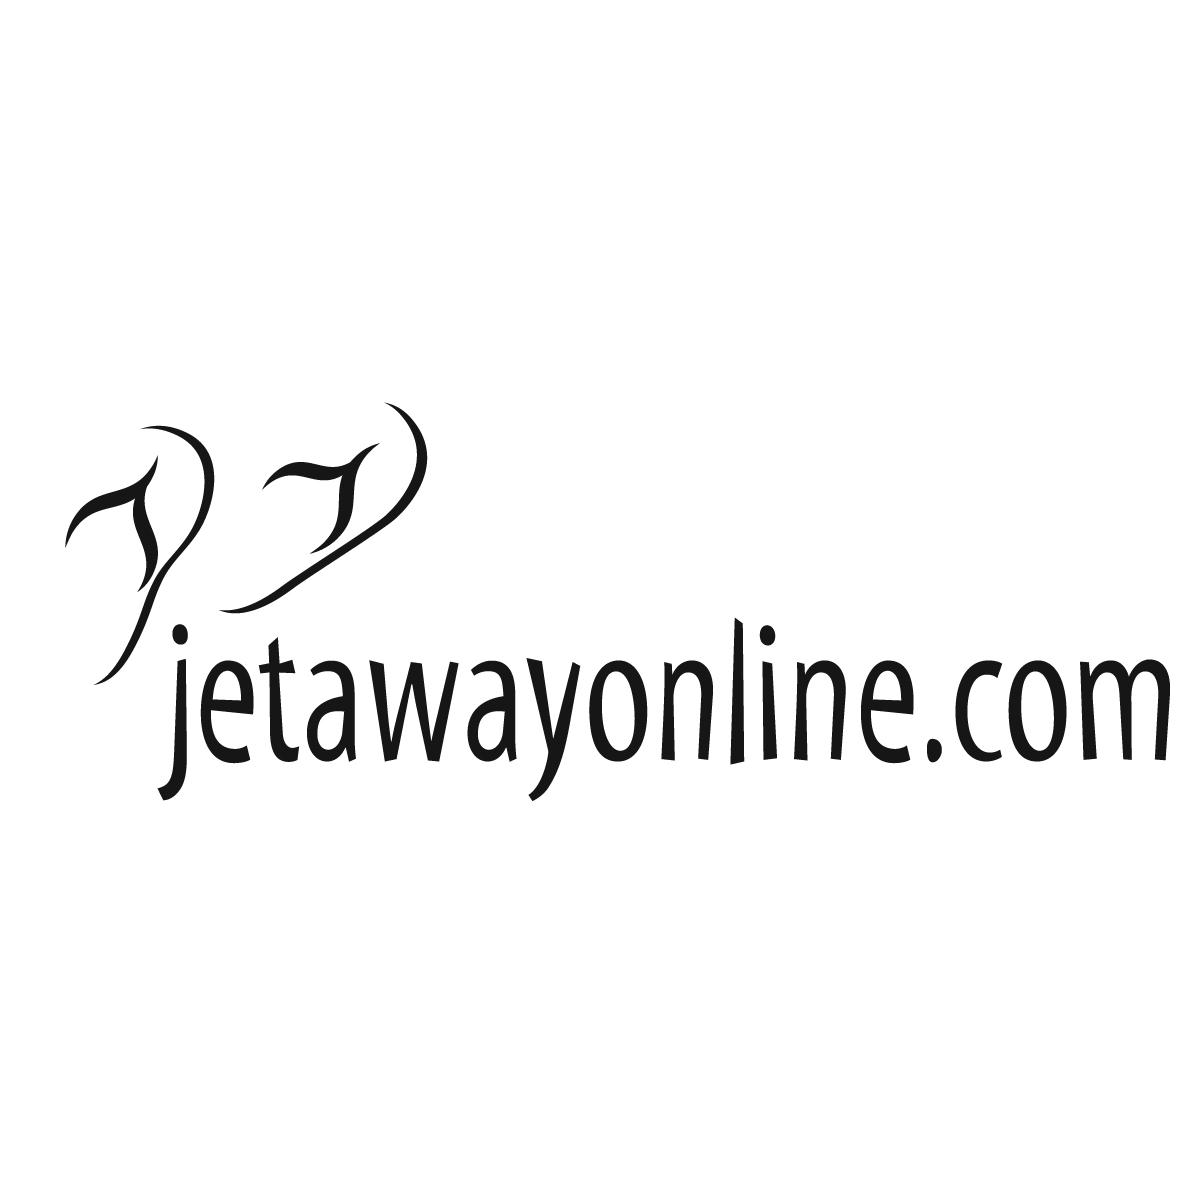 Jetawayonline (Travel Agency)